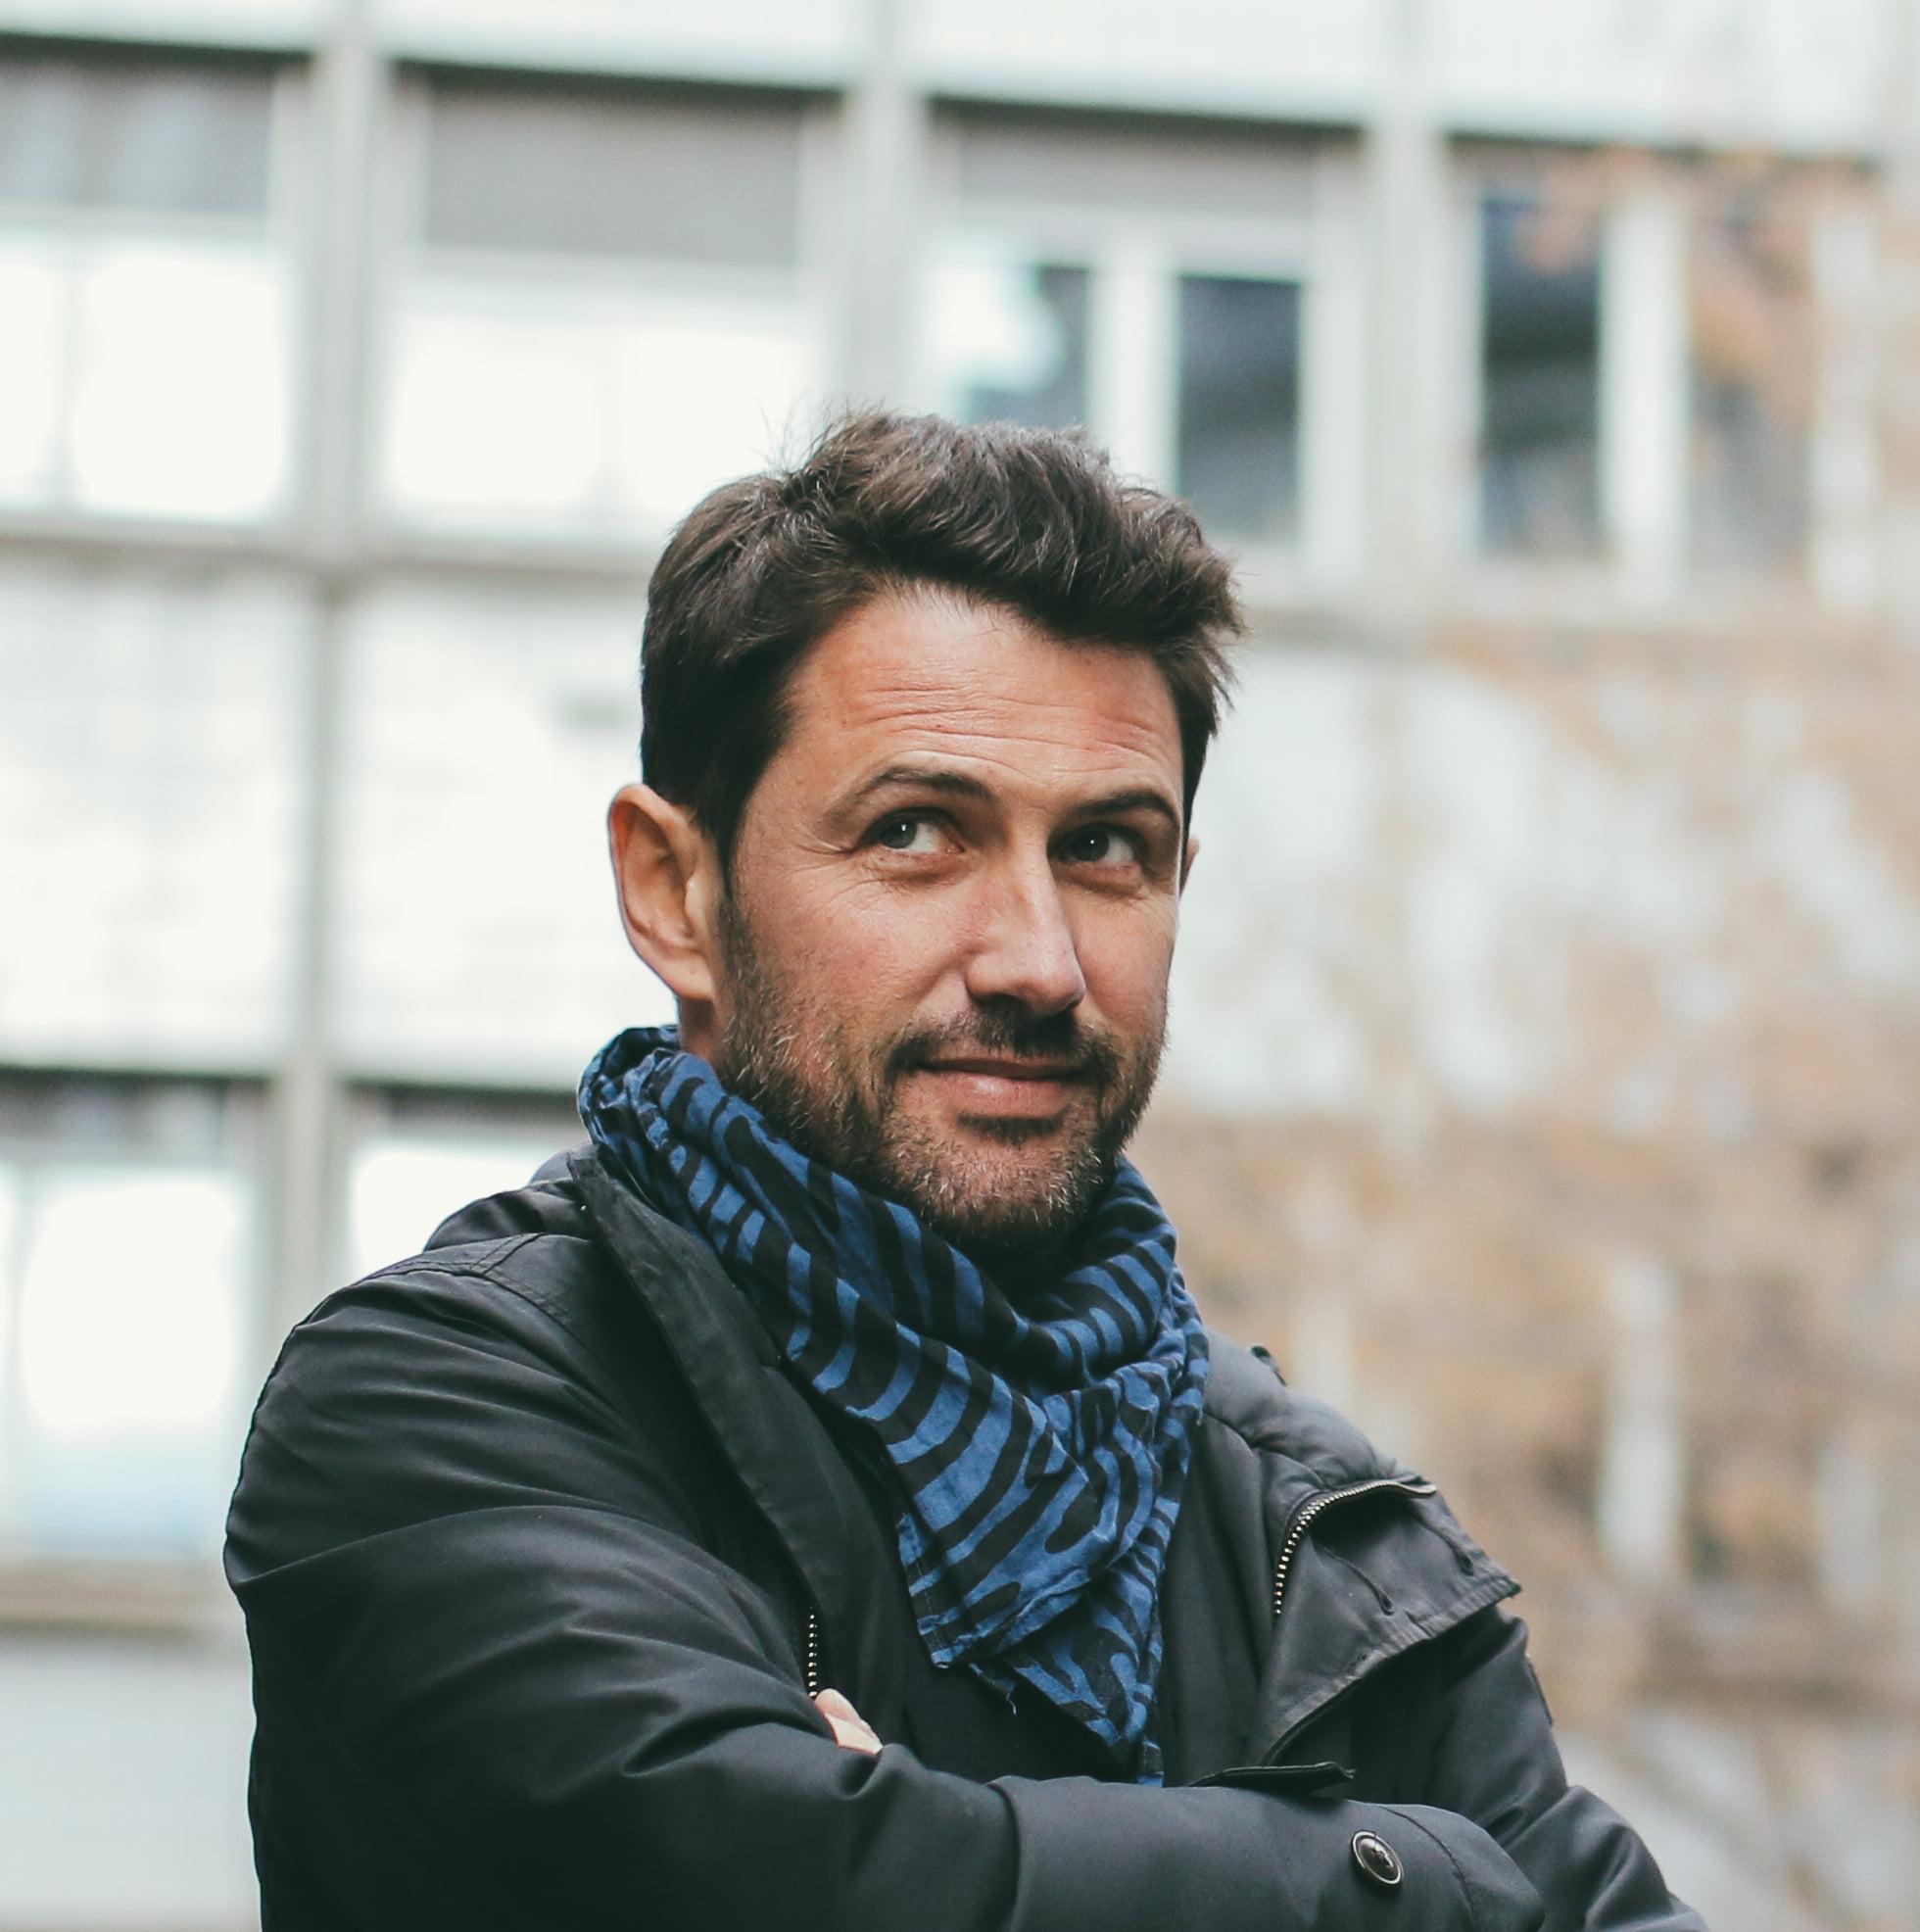 Laurent Perbos